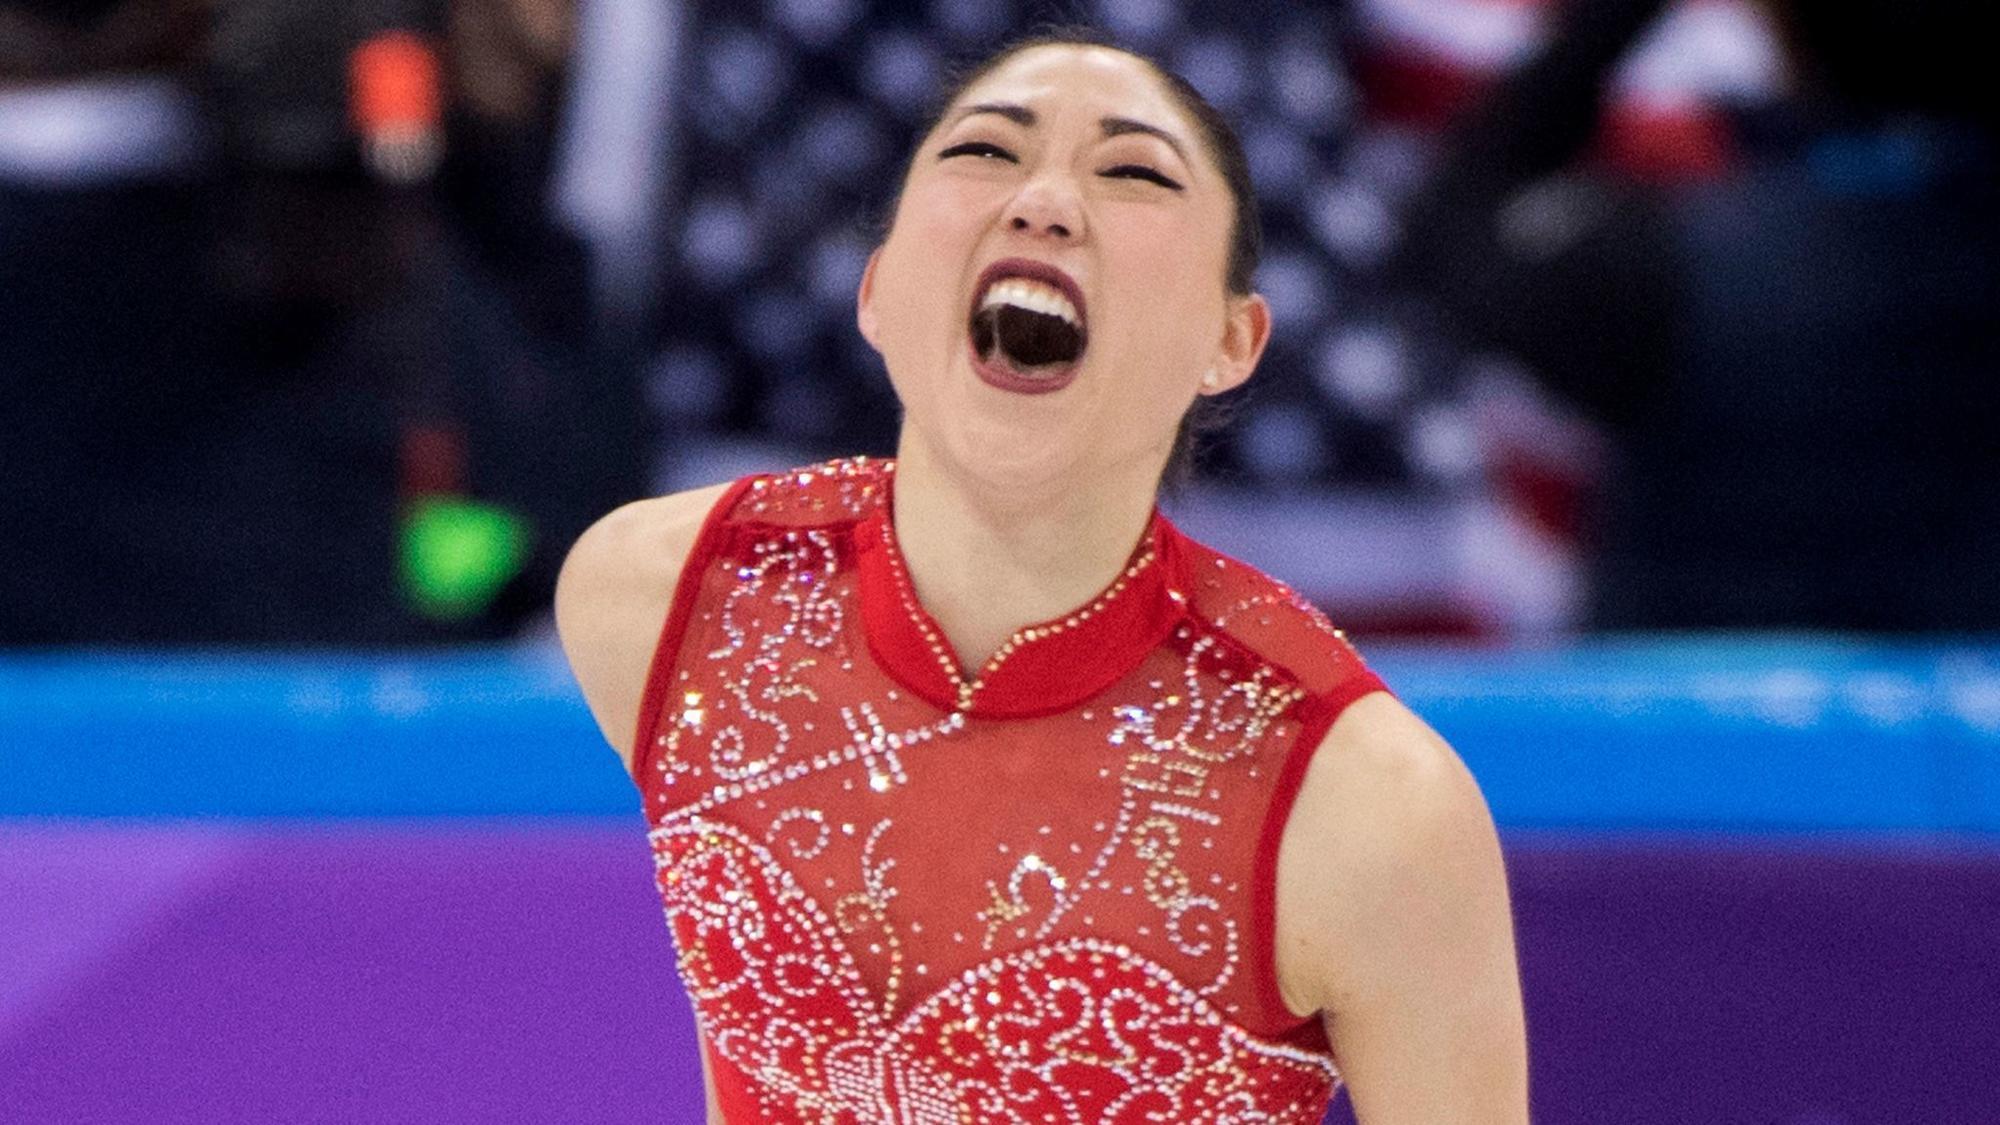 She Just Made Olympic History So Who Is Mirai Nagasu The Morning Call